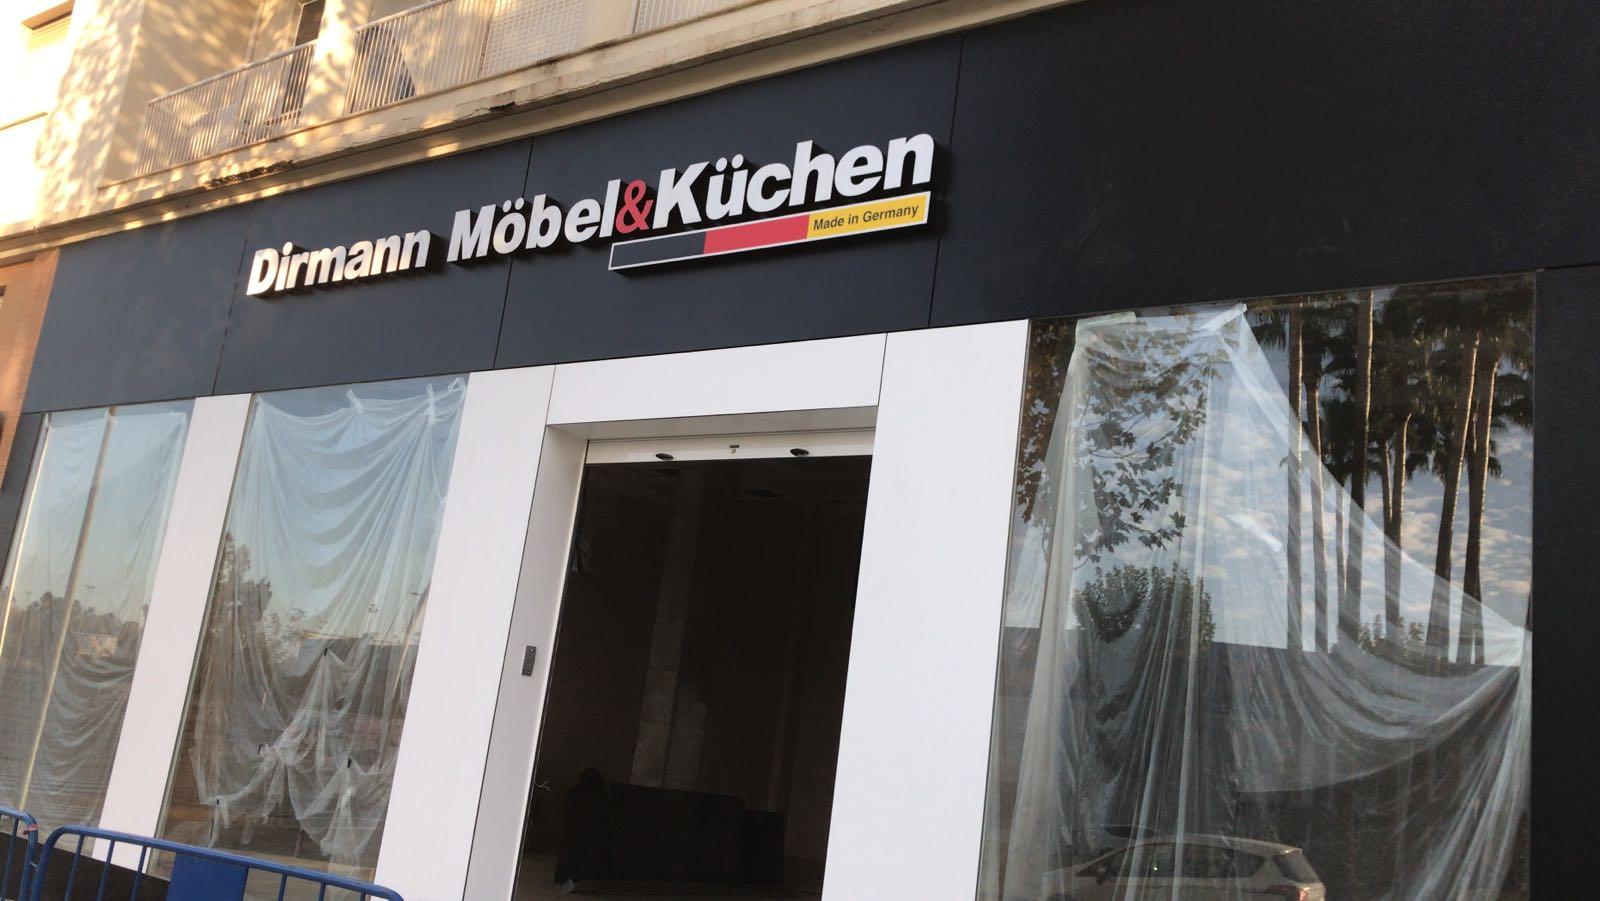 Novedades Cocinas Dirmann Möbel&Küchen